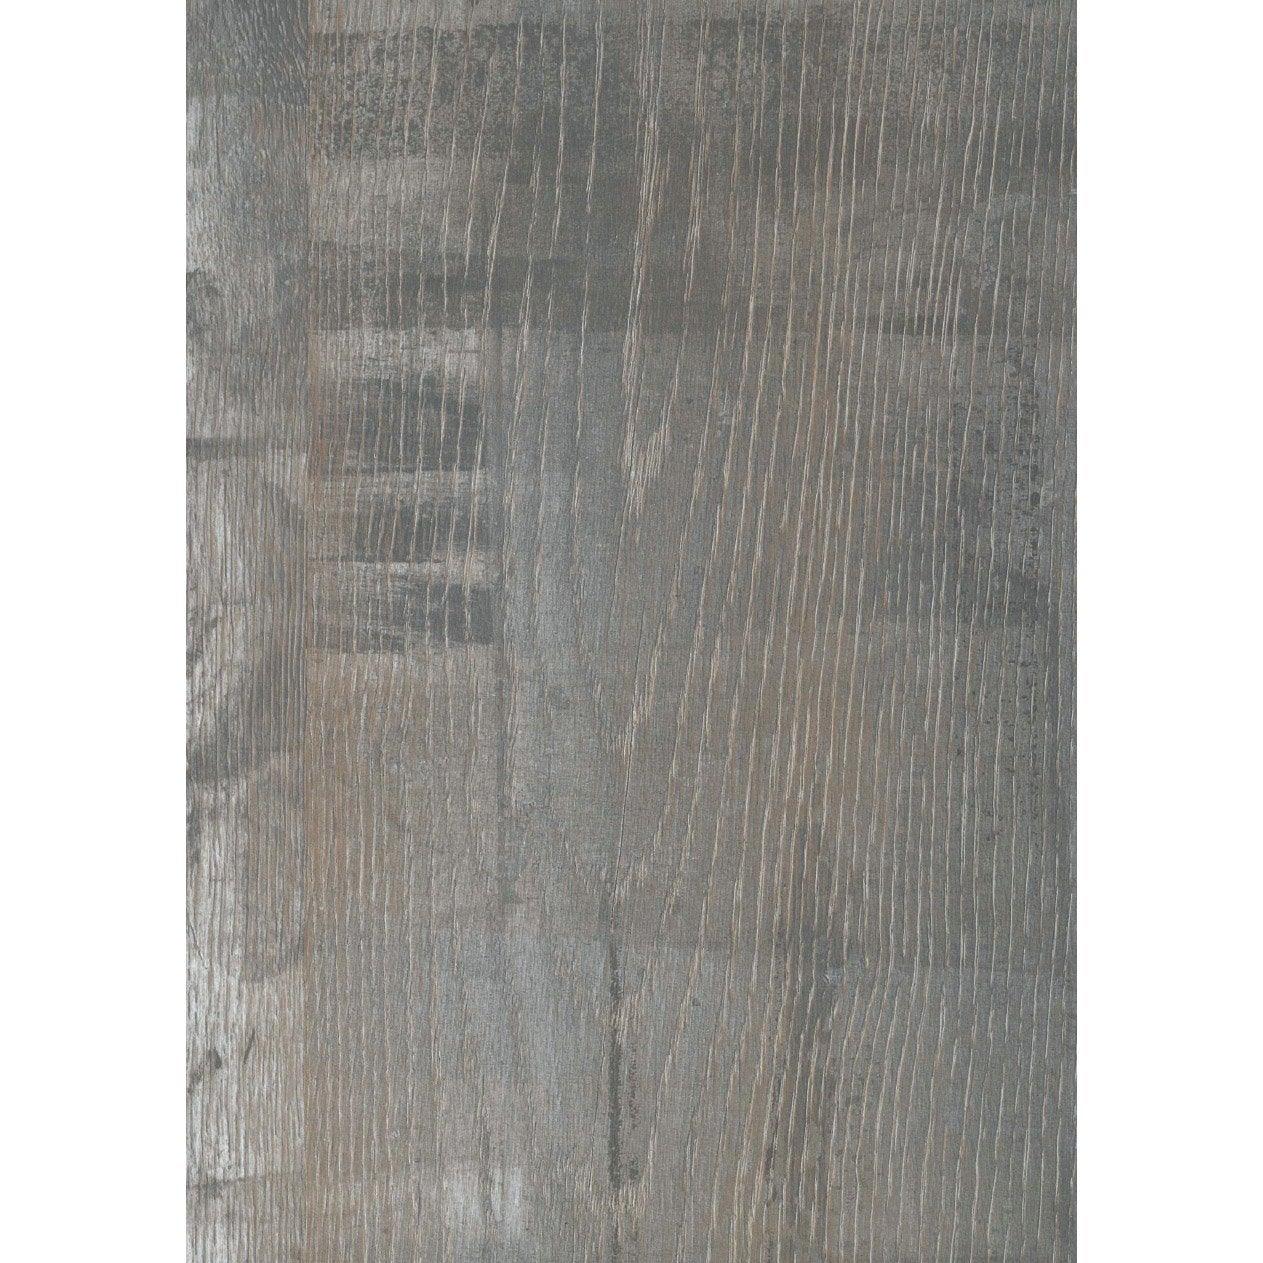 sol stratifi cheverny ep 8 mm origin 39 art leroy merlin. Black Bedroom Furniture Sets. Home Design Ideas